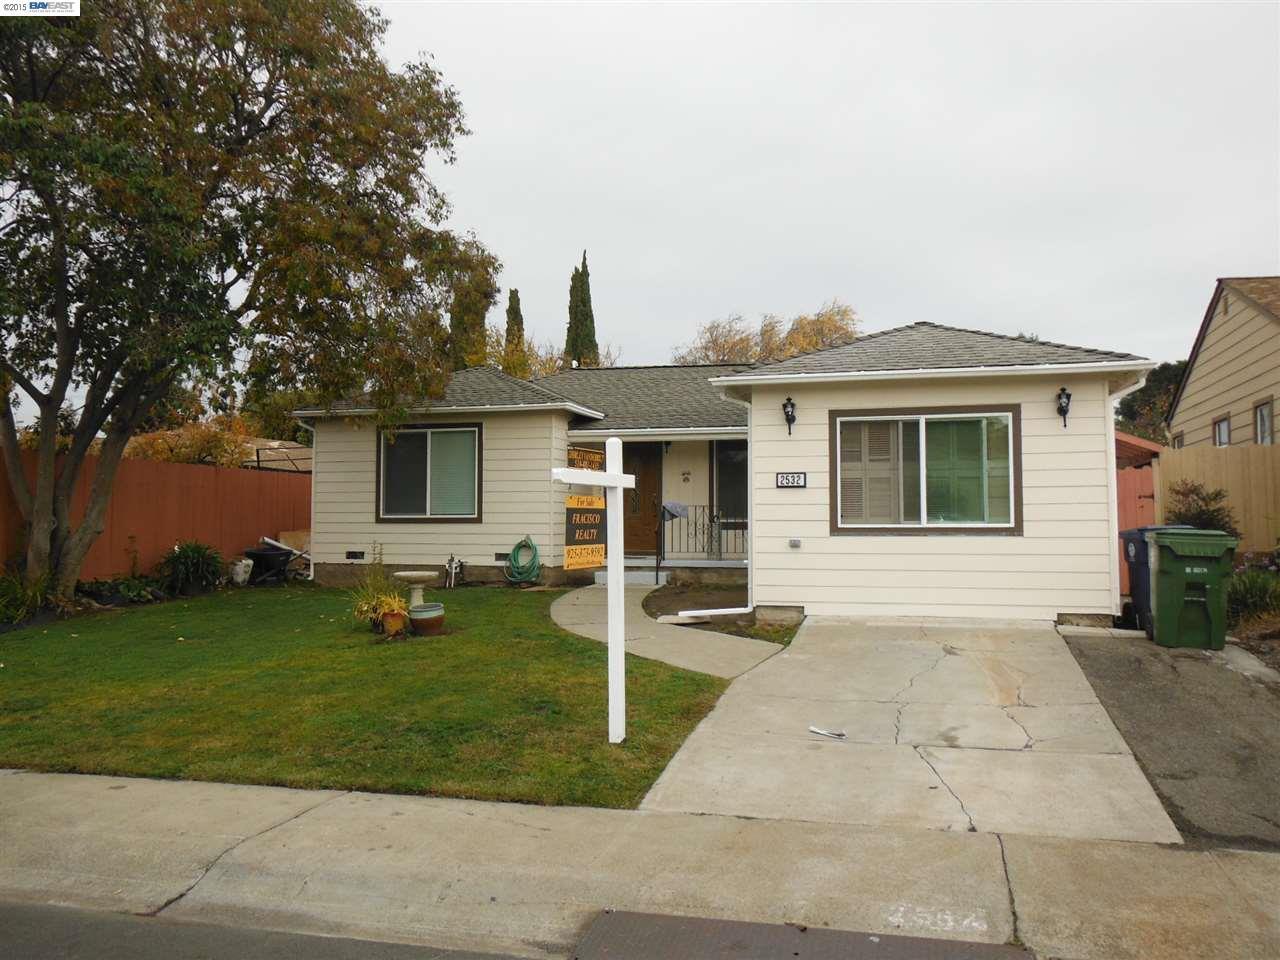 2532 Lessley Ave, Castro Valley, CA